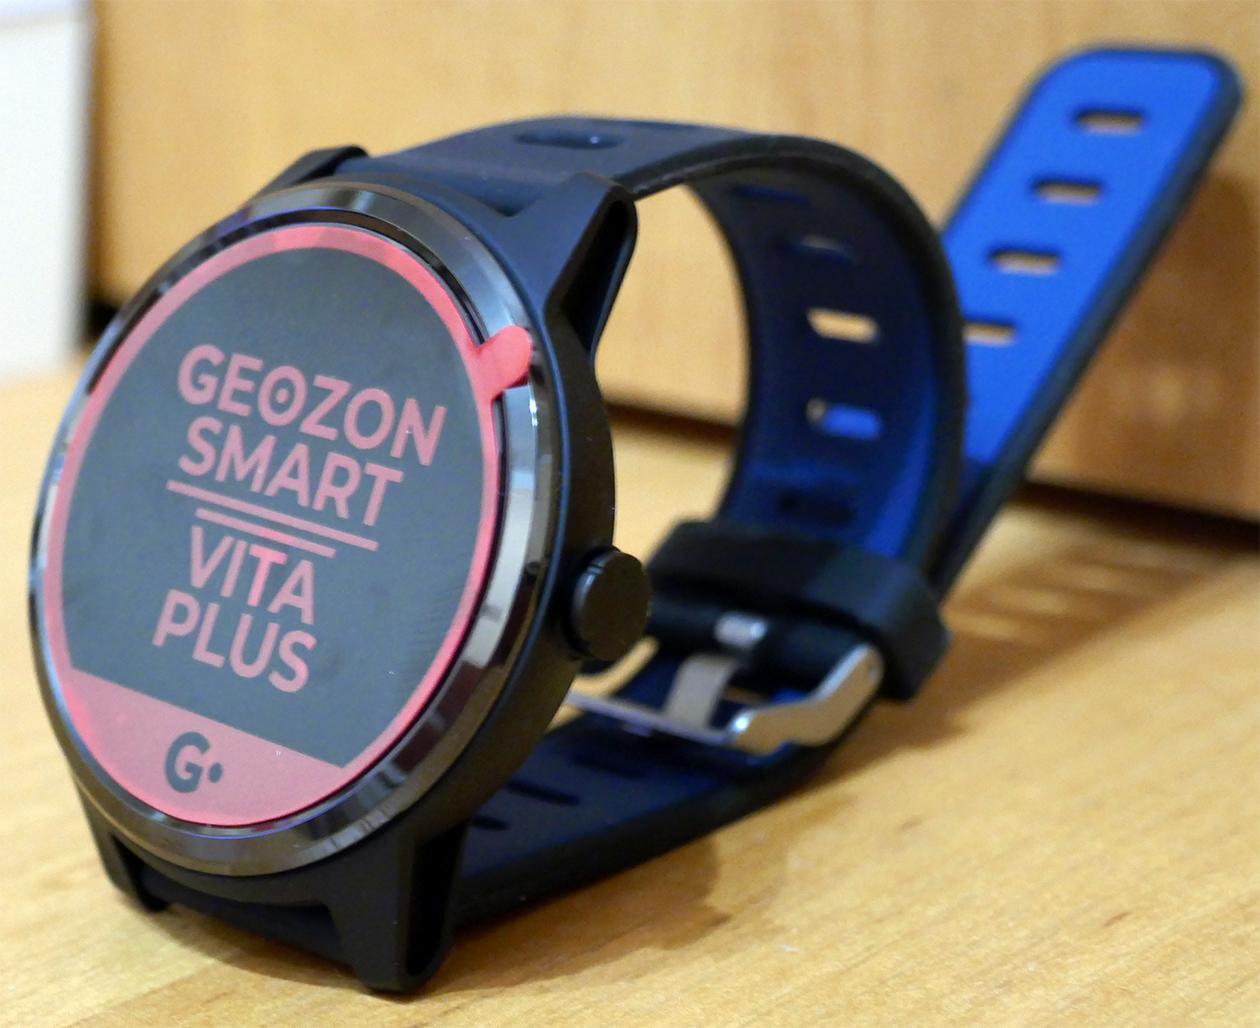 GEOZON Vita Plus